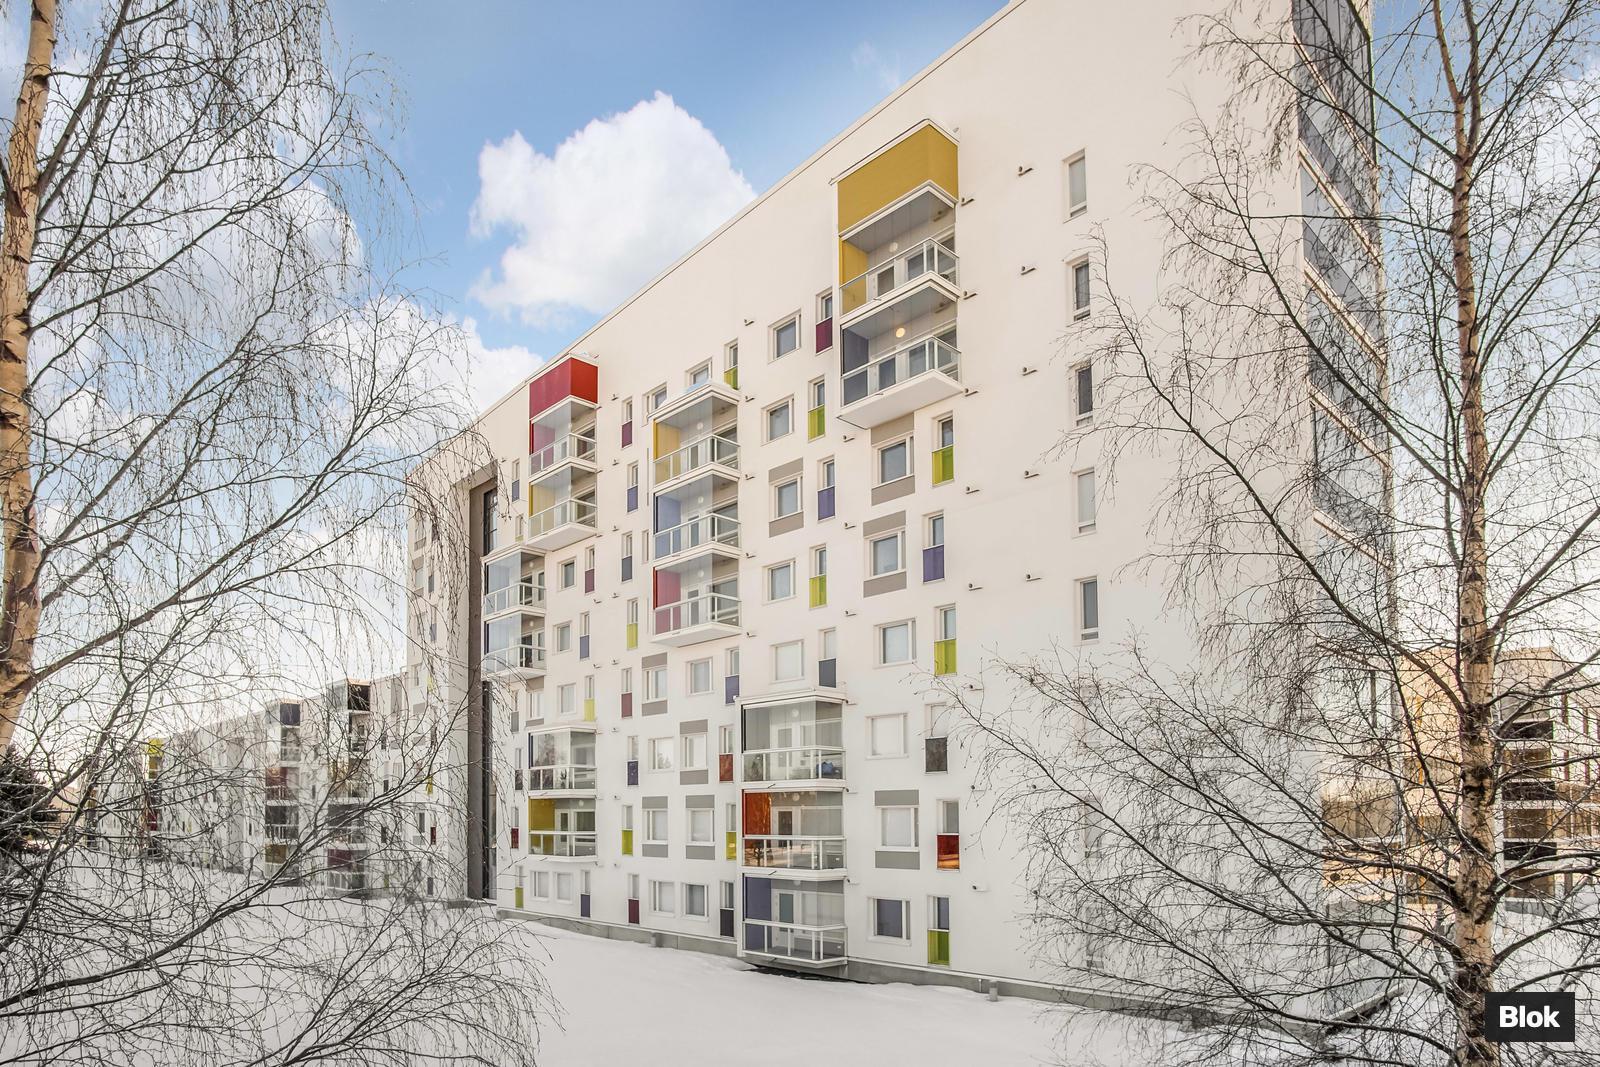 Blok Kauppalinnankatu 1 Linnanmaa Oulu